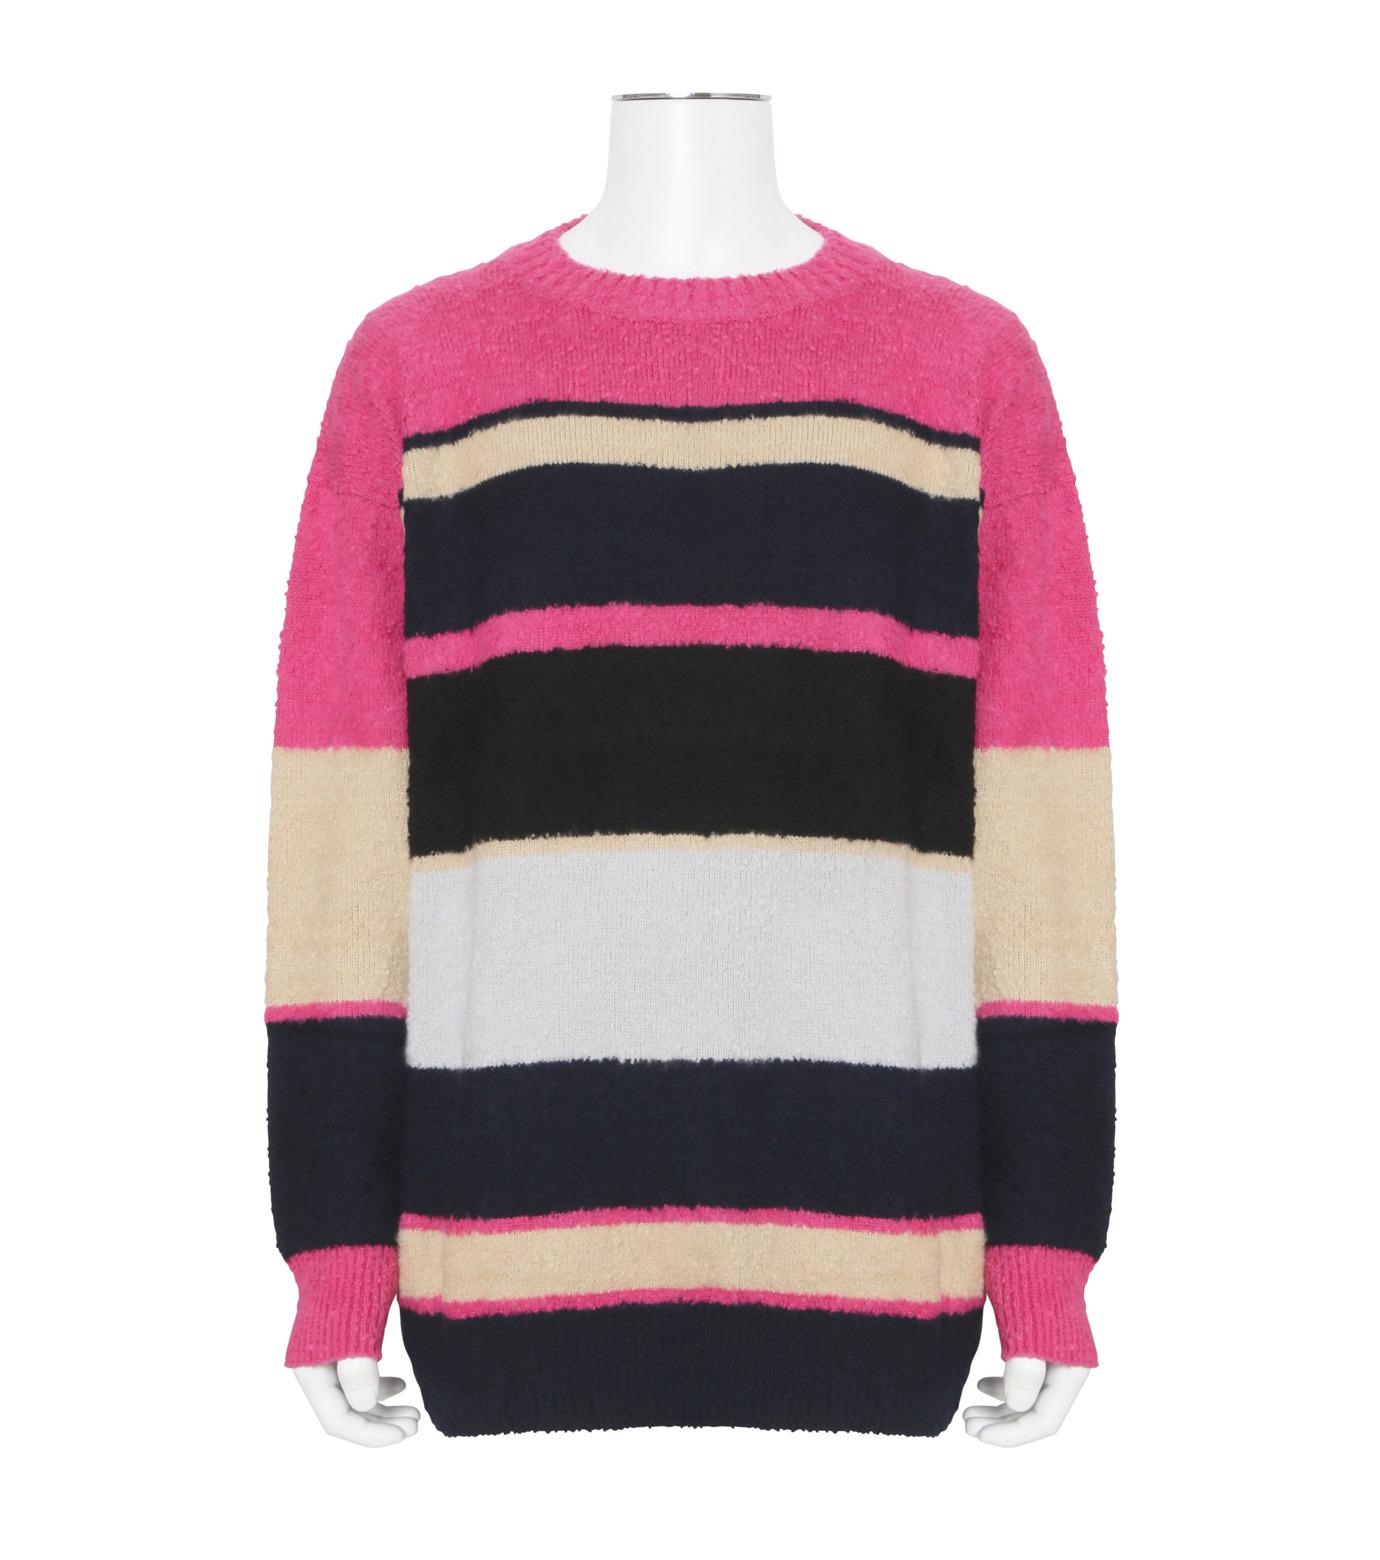 Sacai(サカイ)のPattern Knit-PINK(ニット/knit)-17-01217M-72 拡大詳細画像1